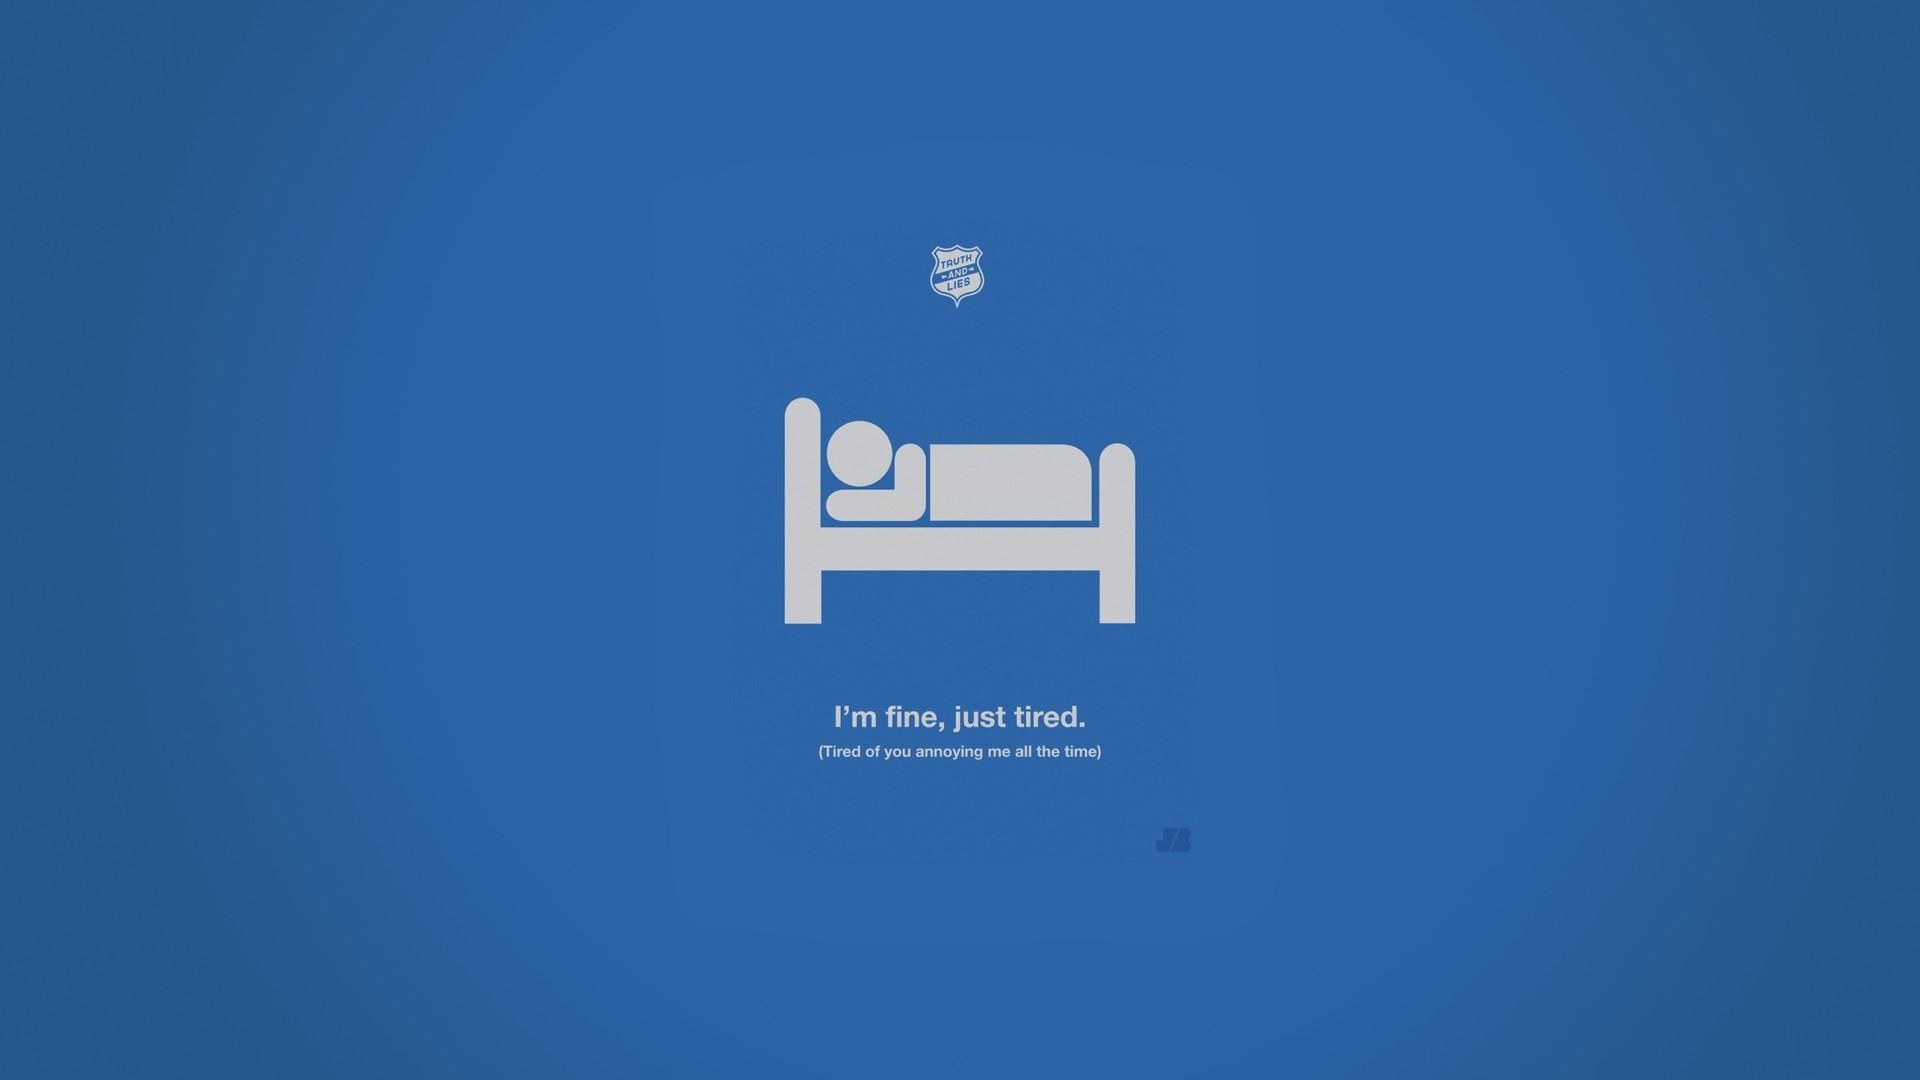 Falling Water Wallpaper 1080p Blue Tired Minimal Wallpaper 1920x1080 117235